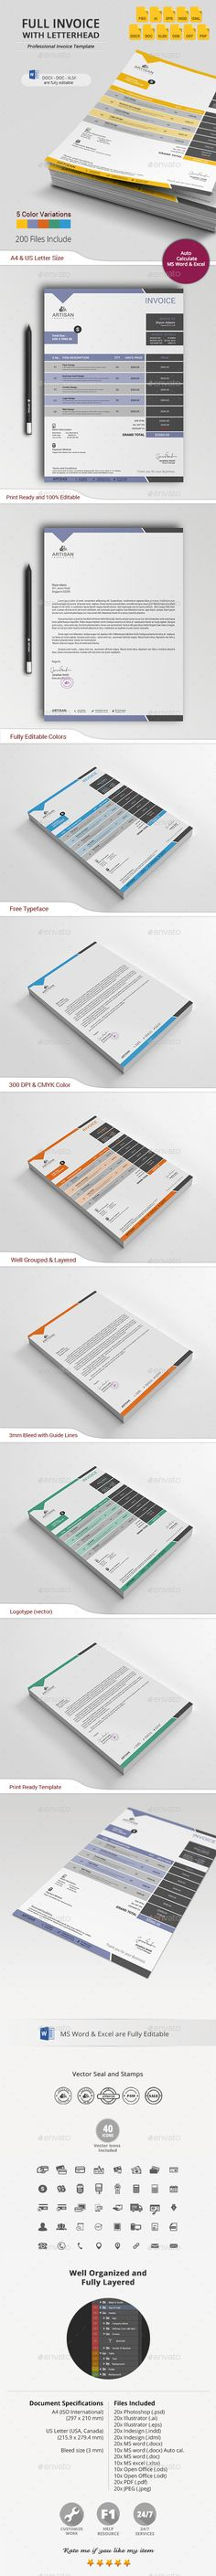 Invoice Template Invoice template and Templates